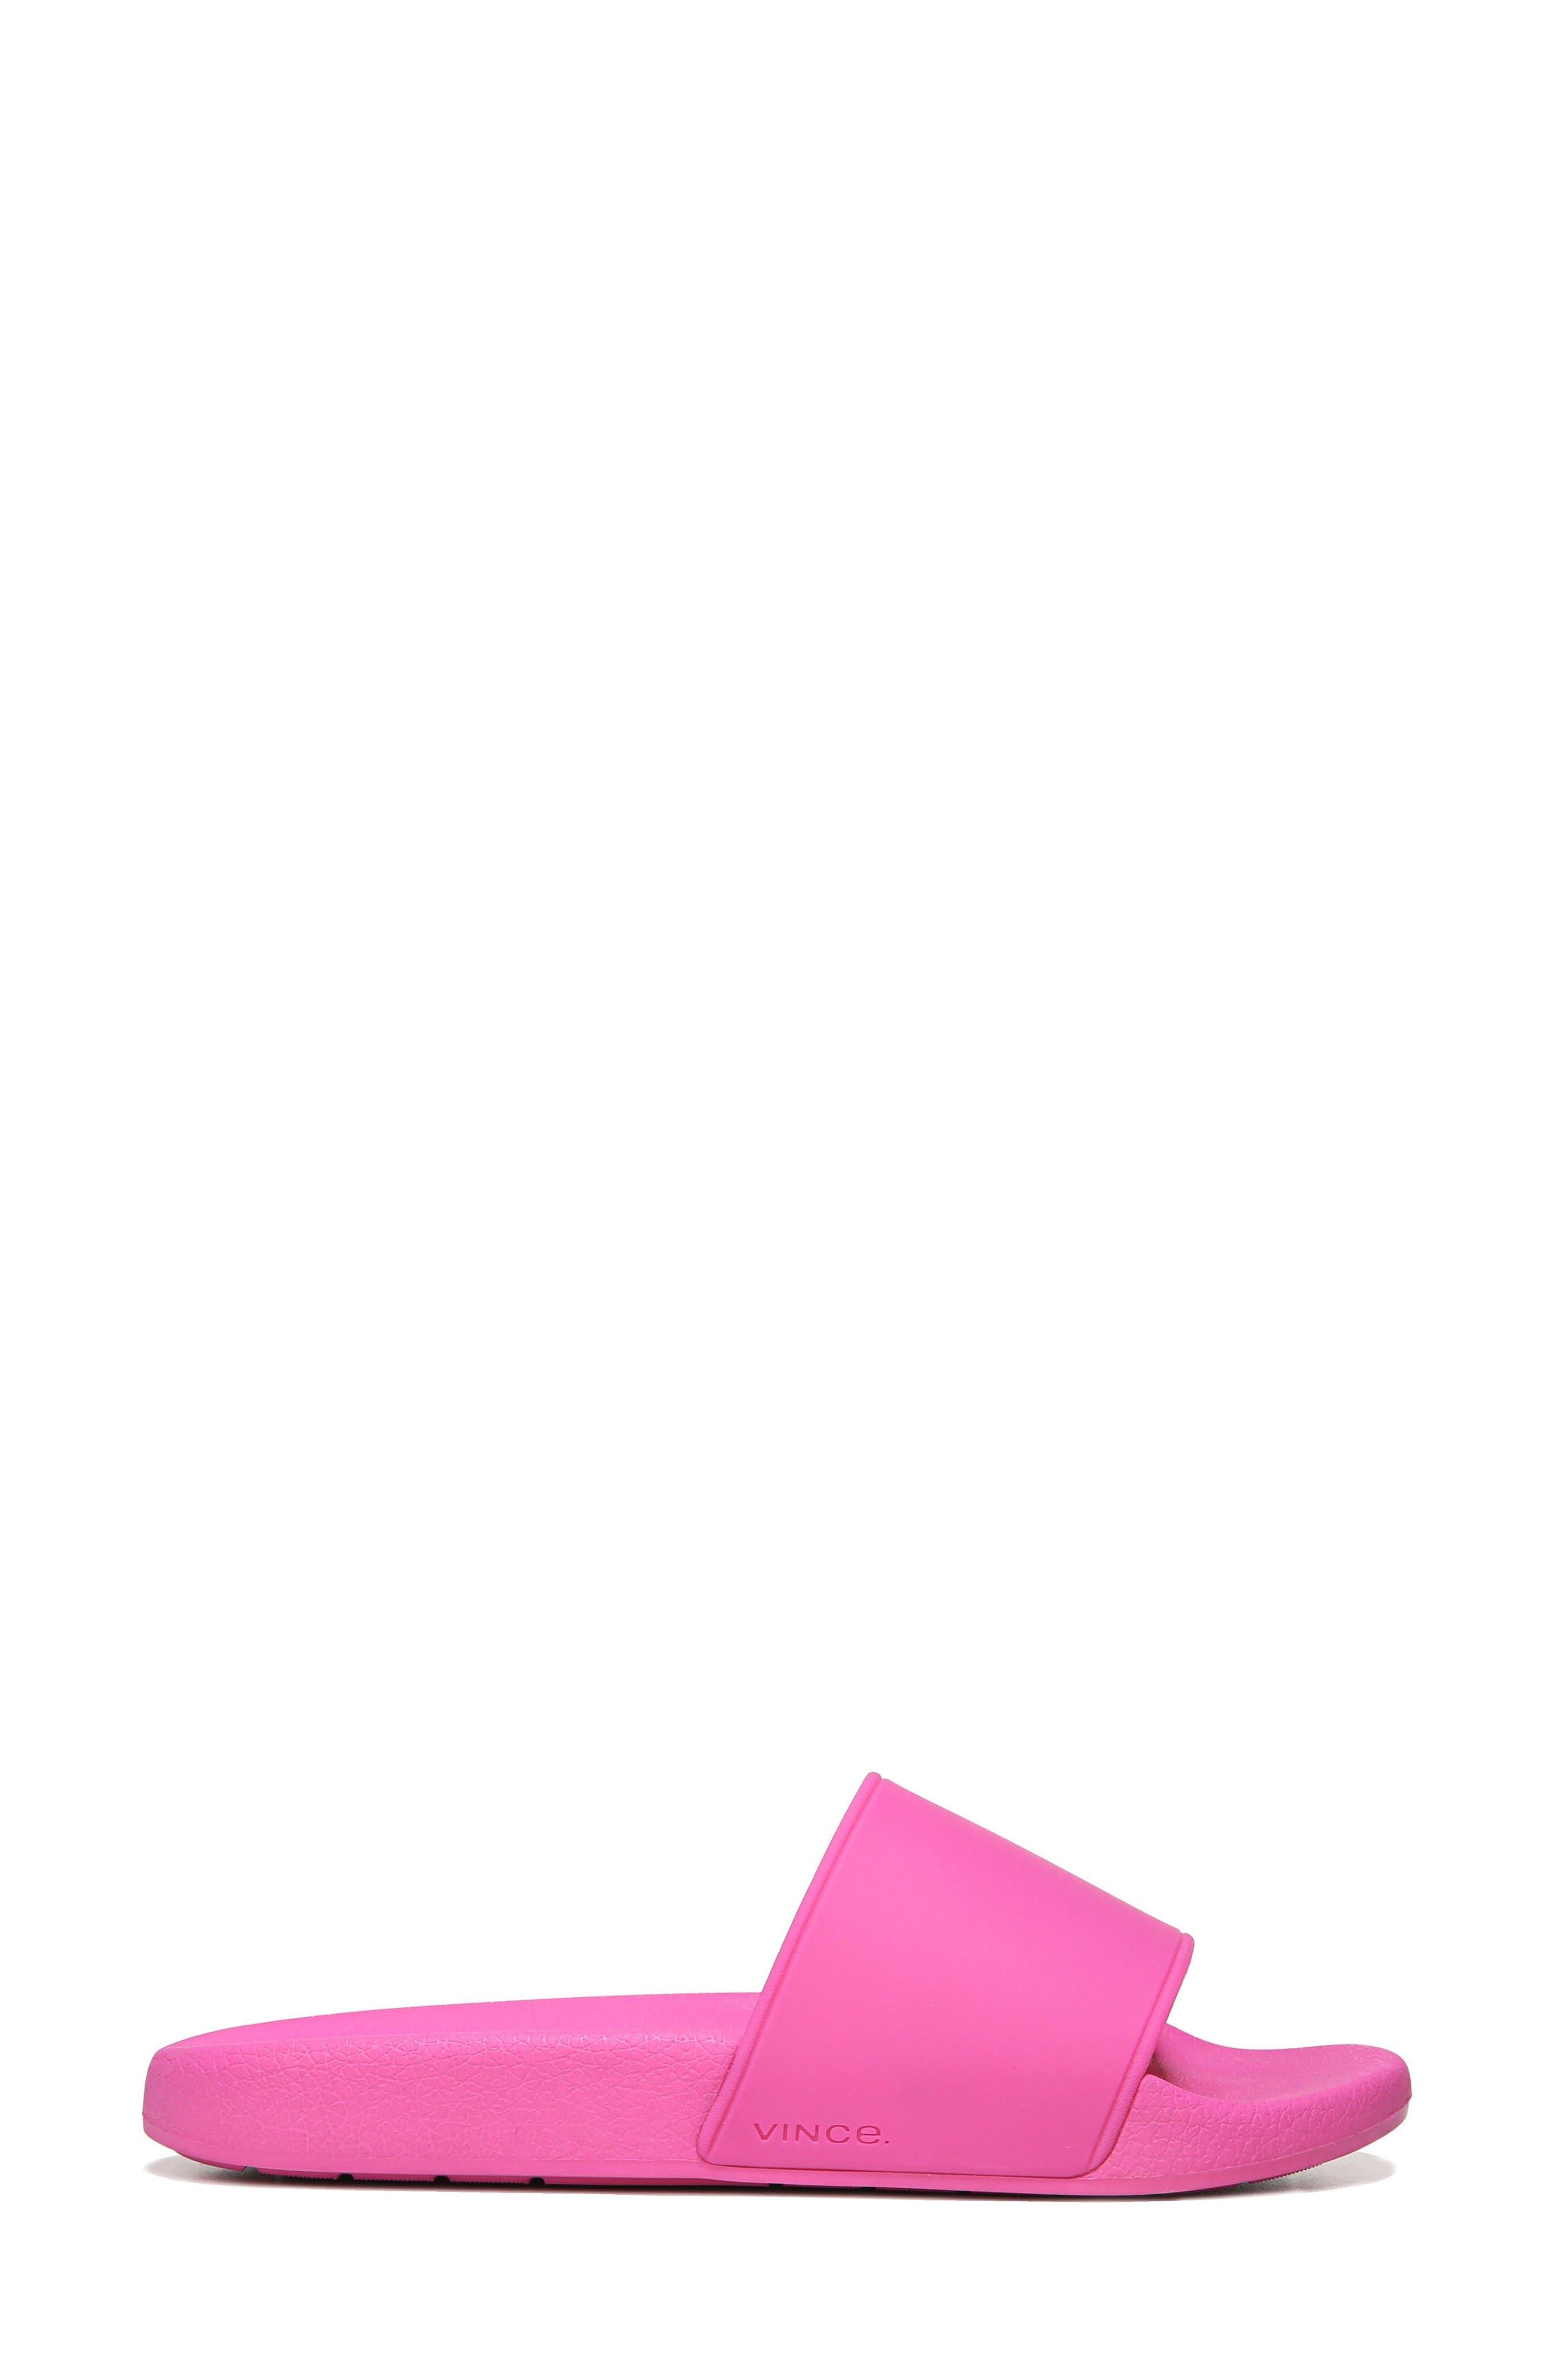 Westcoast Slide Sandal,                             Alternate thumbnail 24, color,